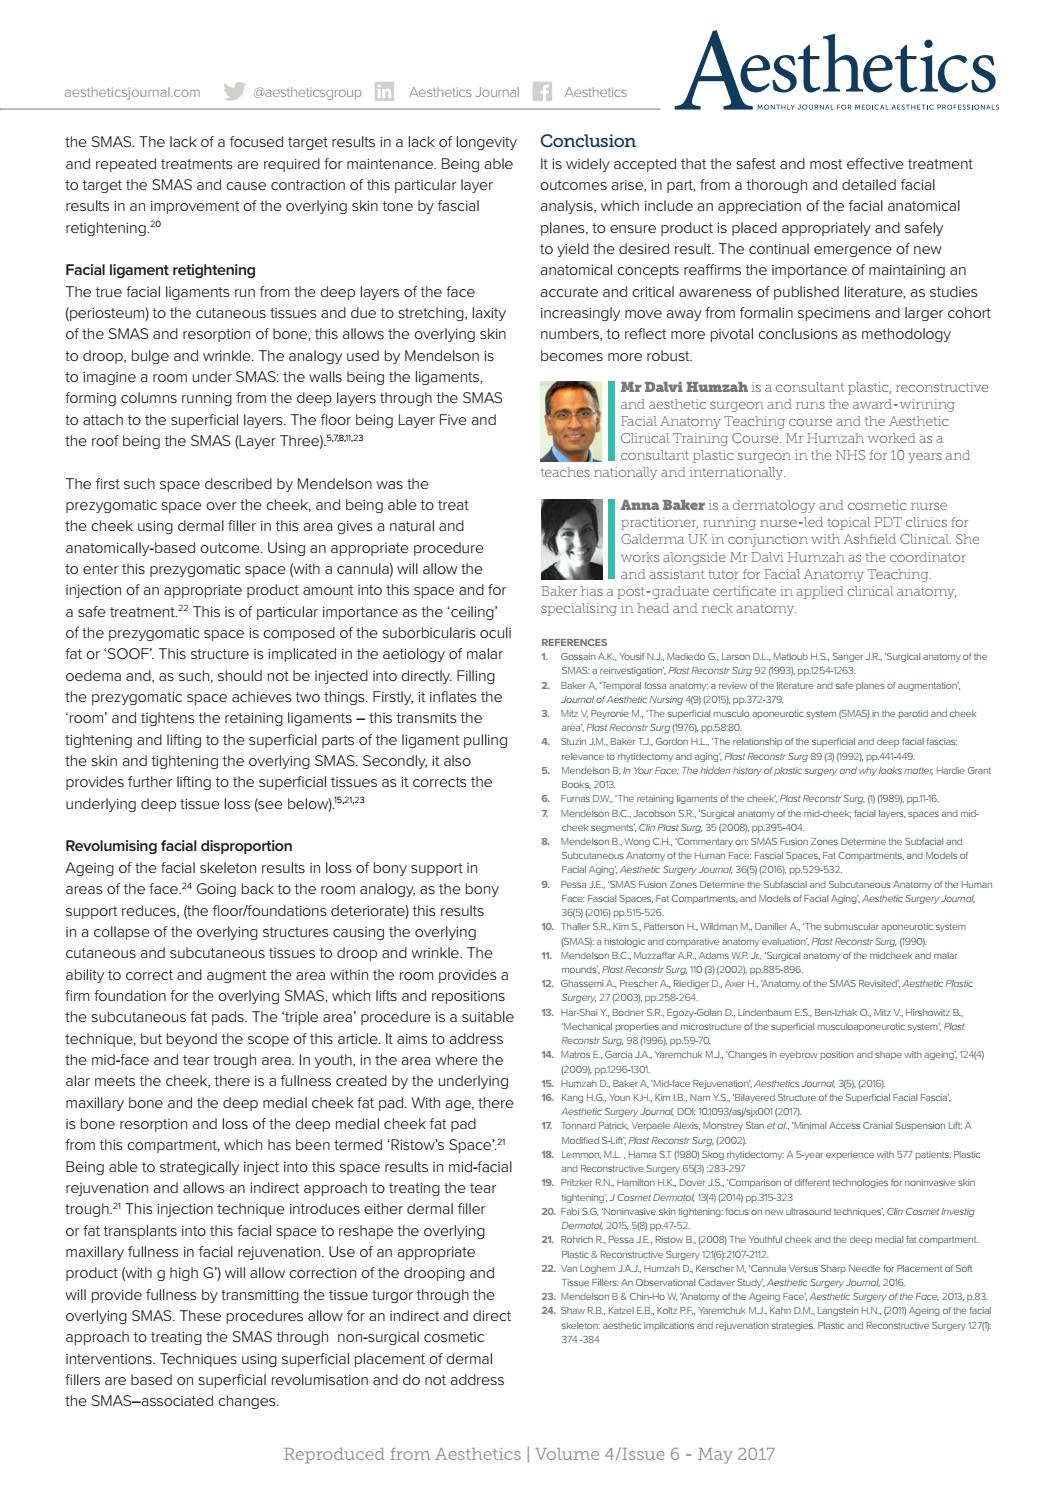 Aesthetics May 2017 By Aesthetics Journal Issuu